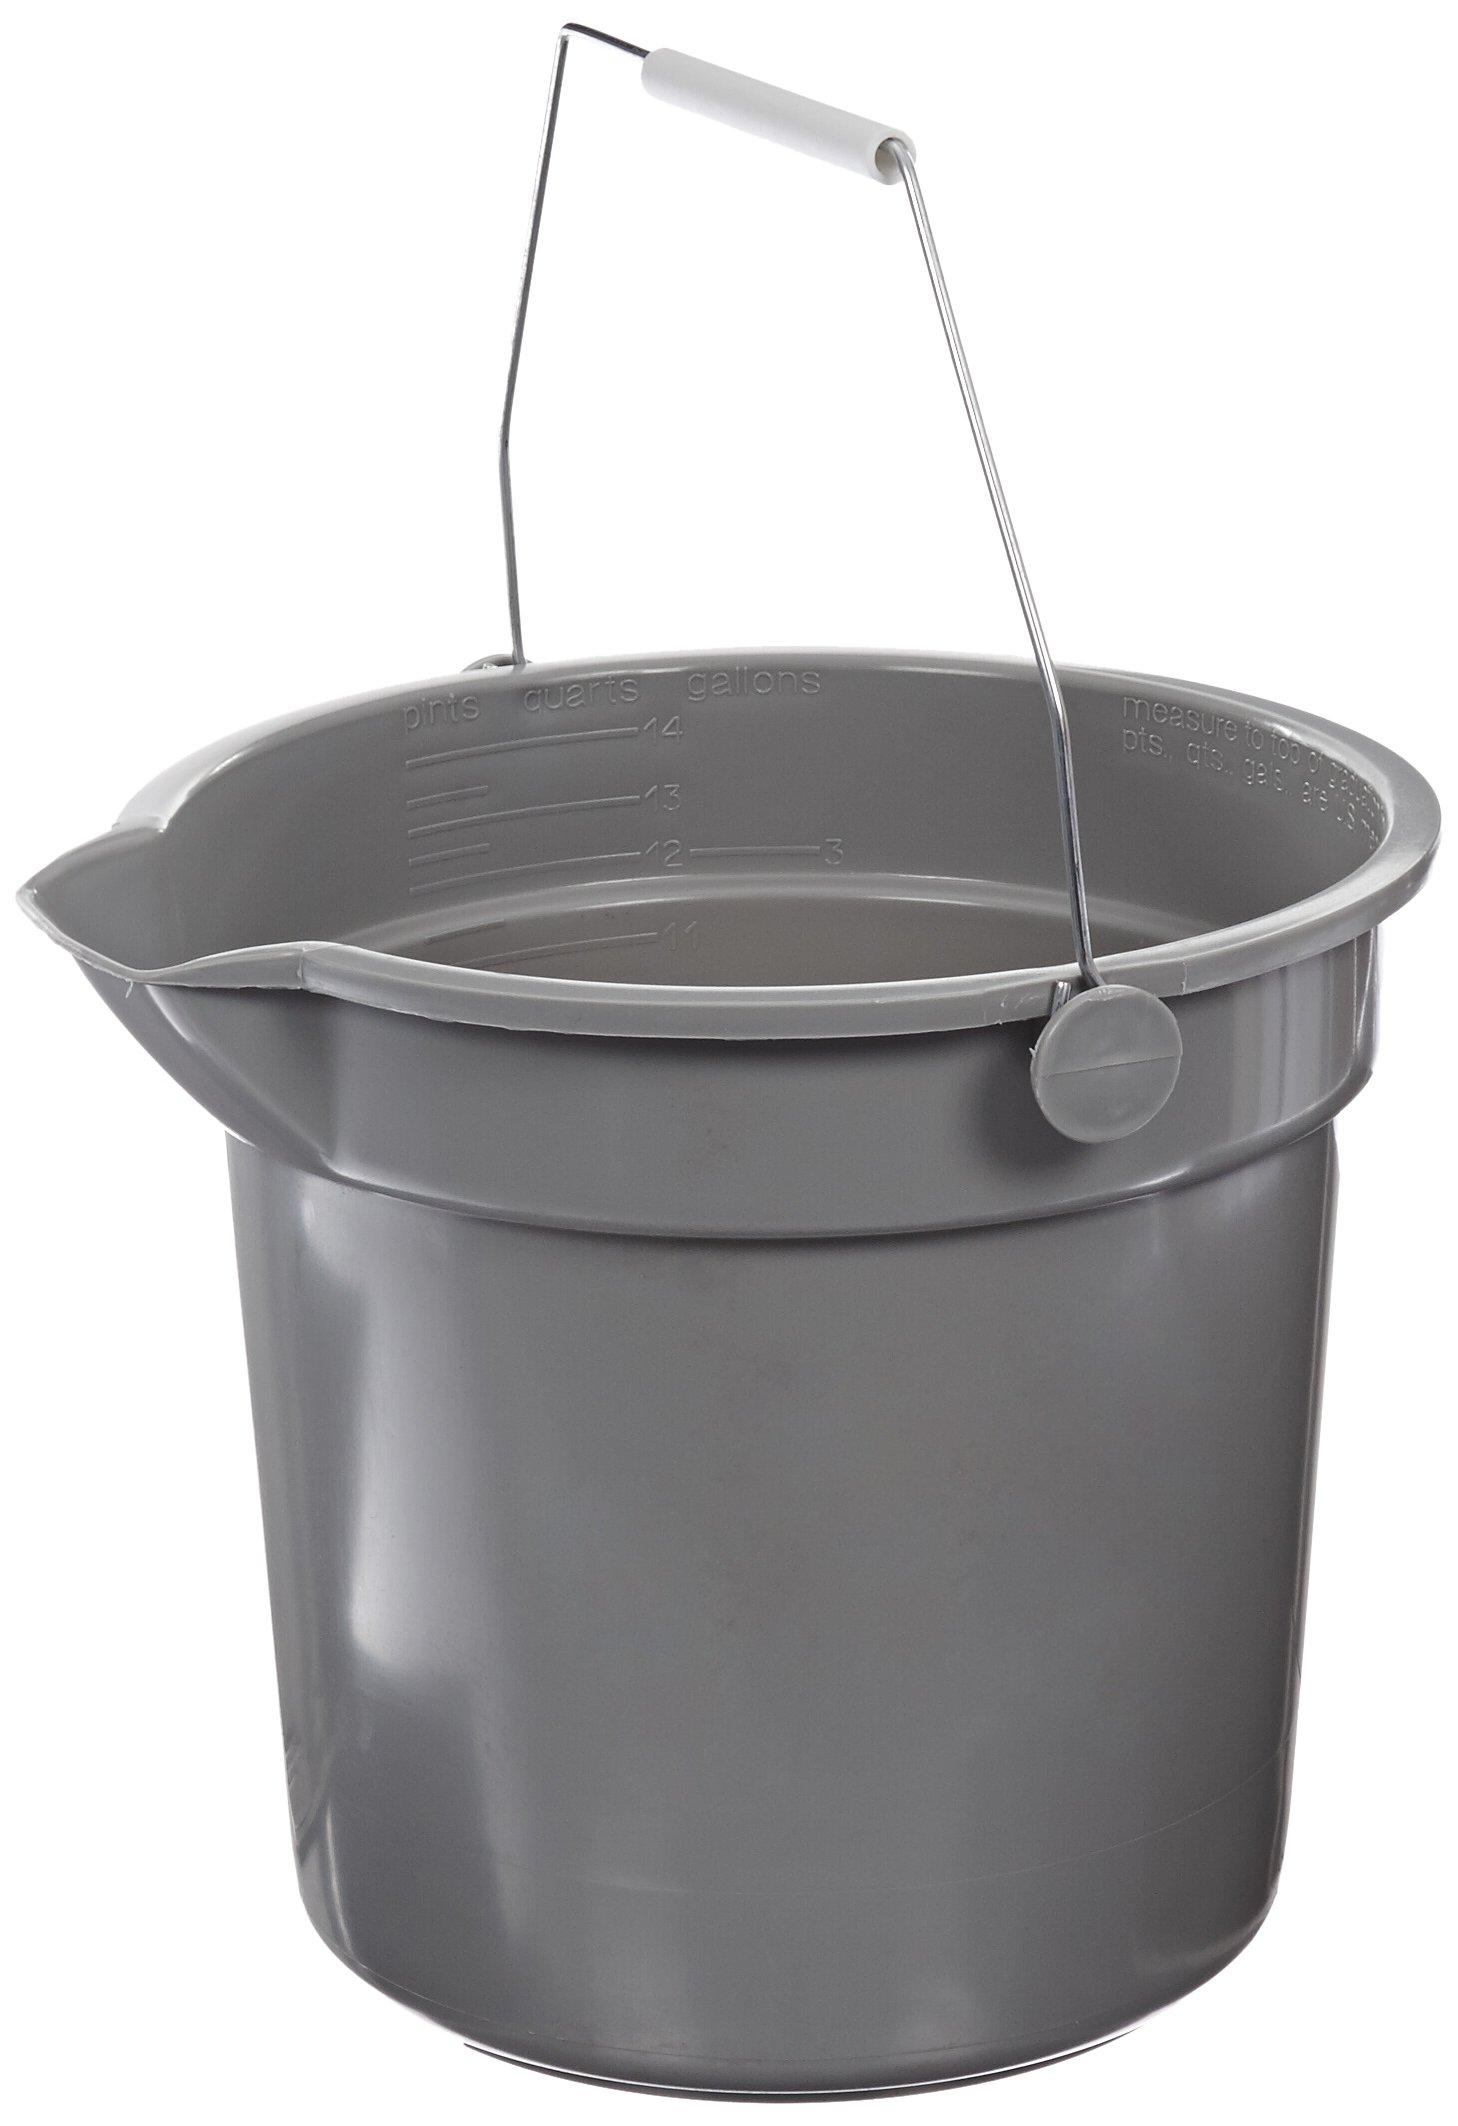 Impact 5514 Polypropylene Deluxe Heavy-Duty Bucket, 14 qt Capacity, 10'' Length x 14-1/8'' Width x 12-1/2'' Height, Gray (Case of 6)